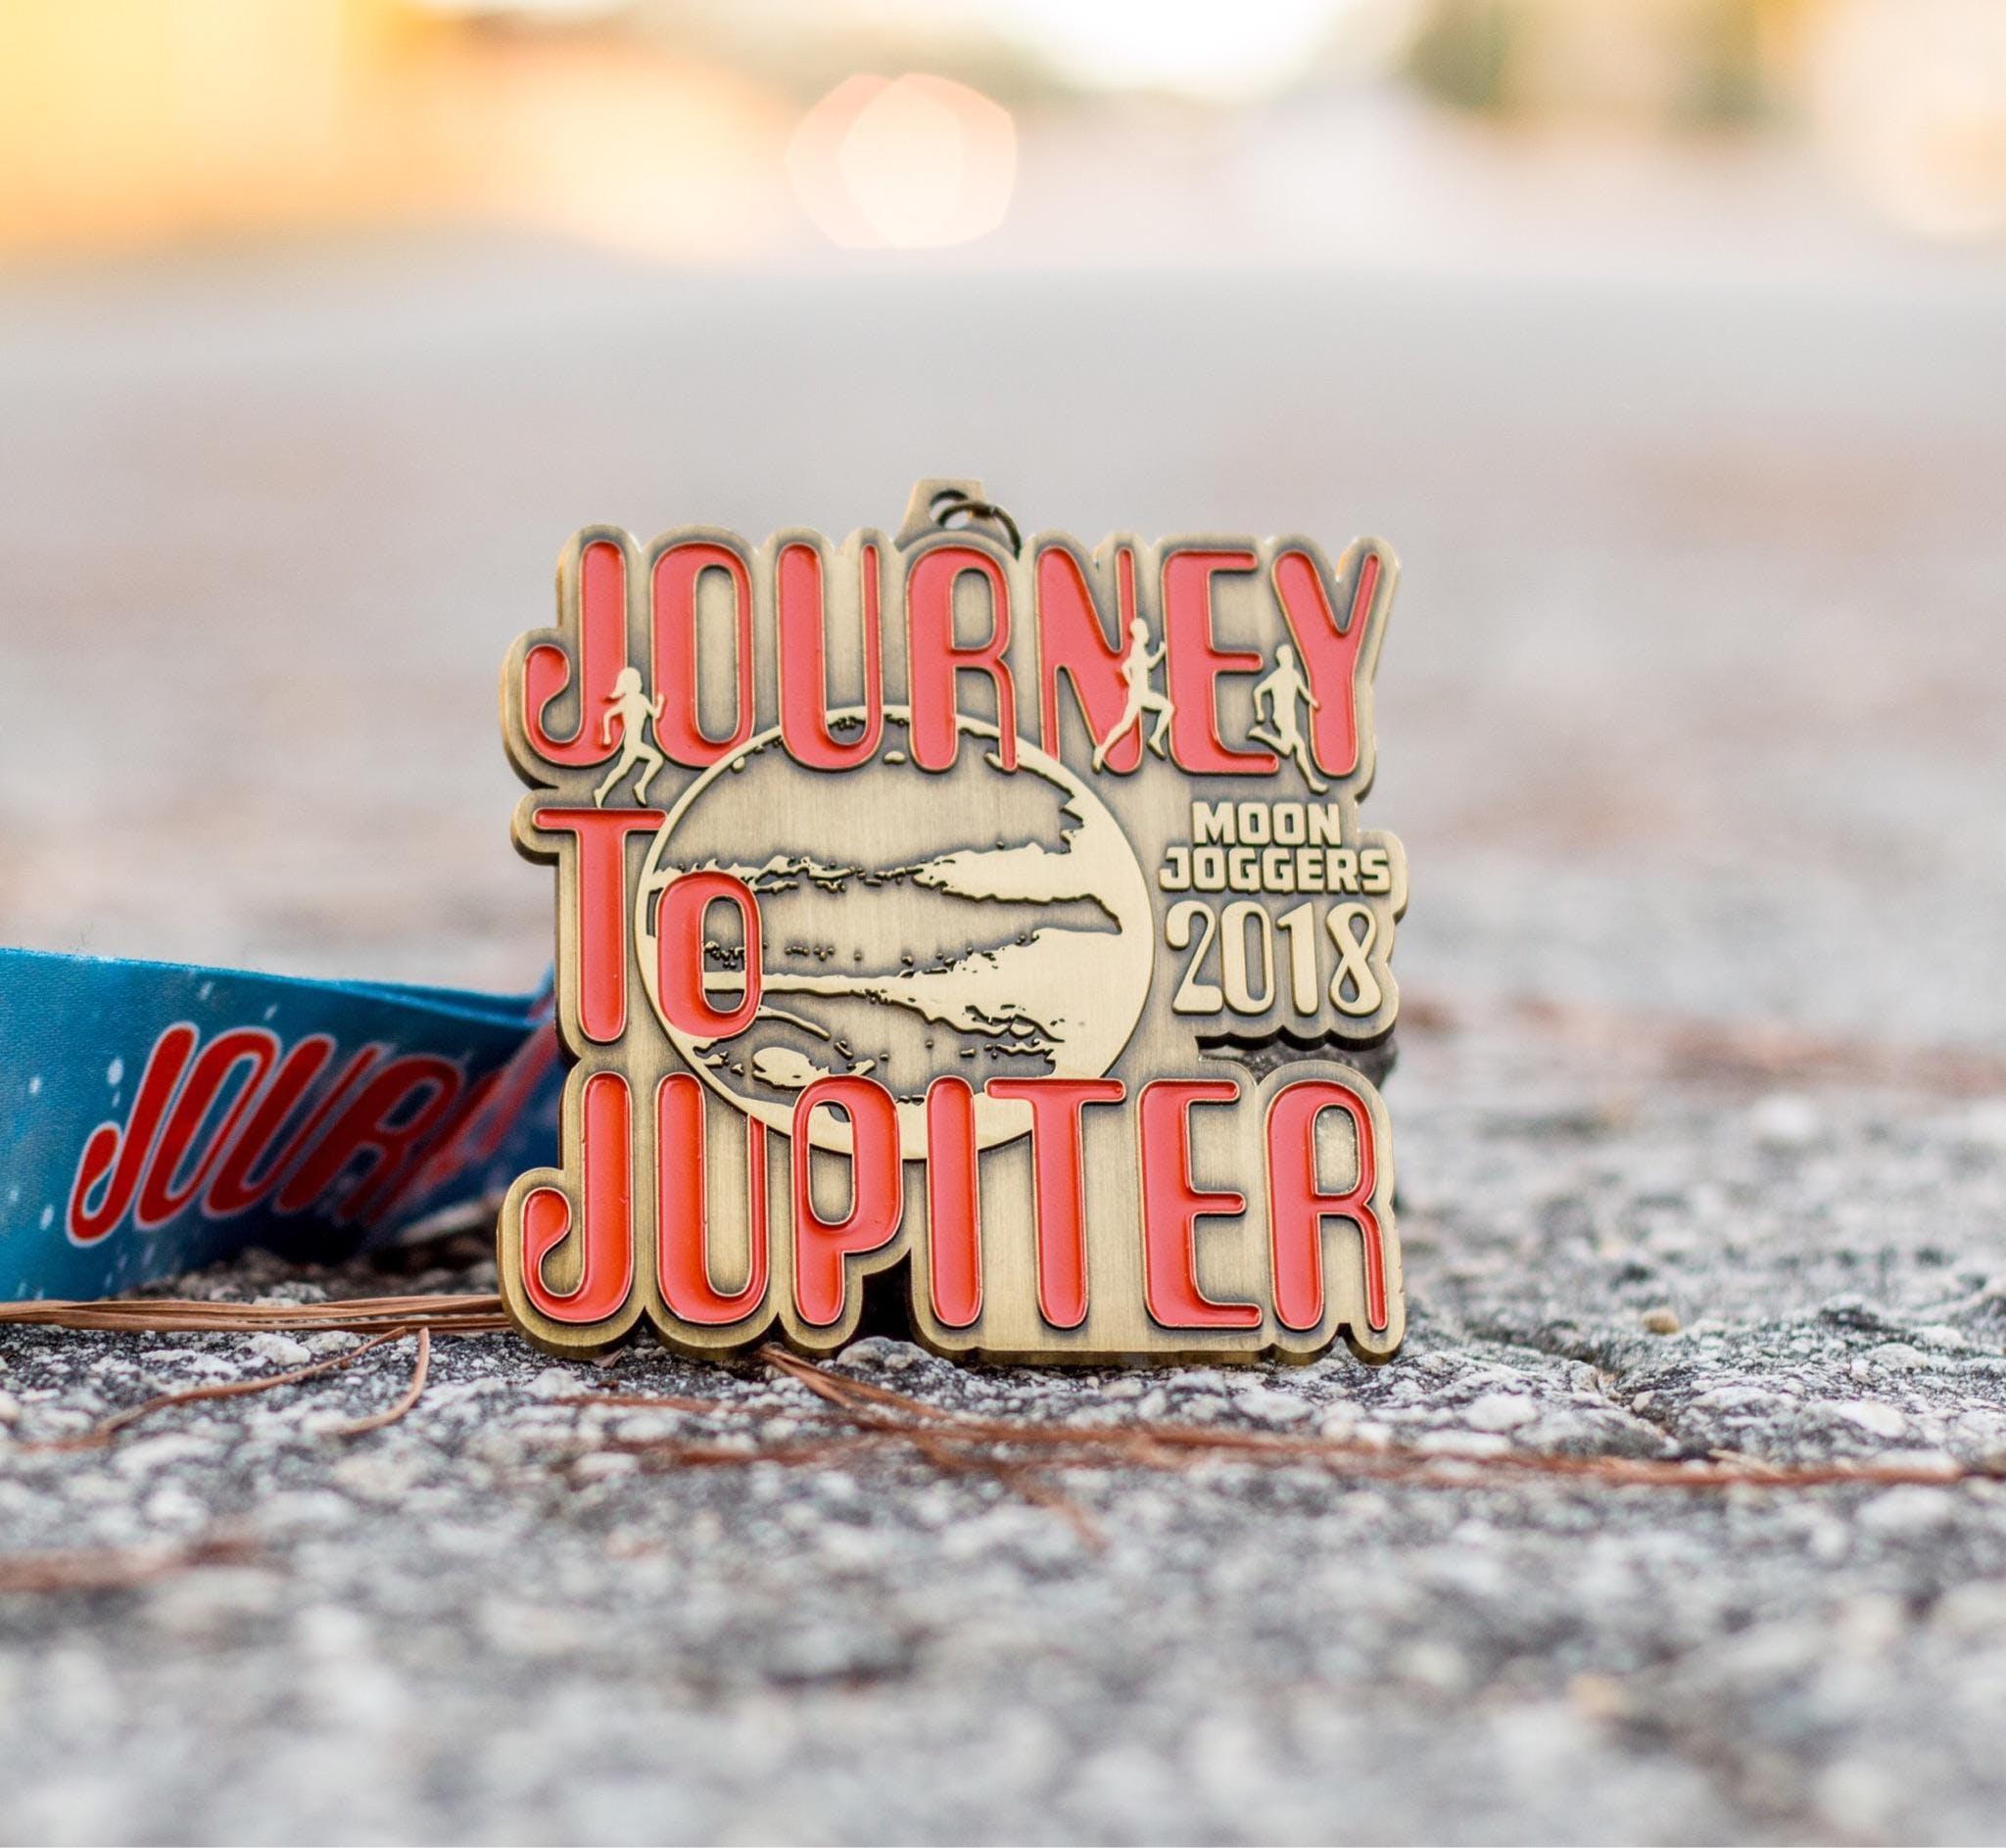 FREE SIGN UP: Journey to Jupiter Running & Walking Challenge 2018 -Birmingham